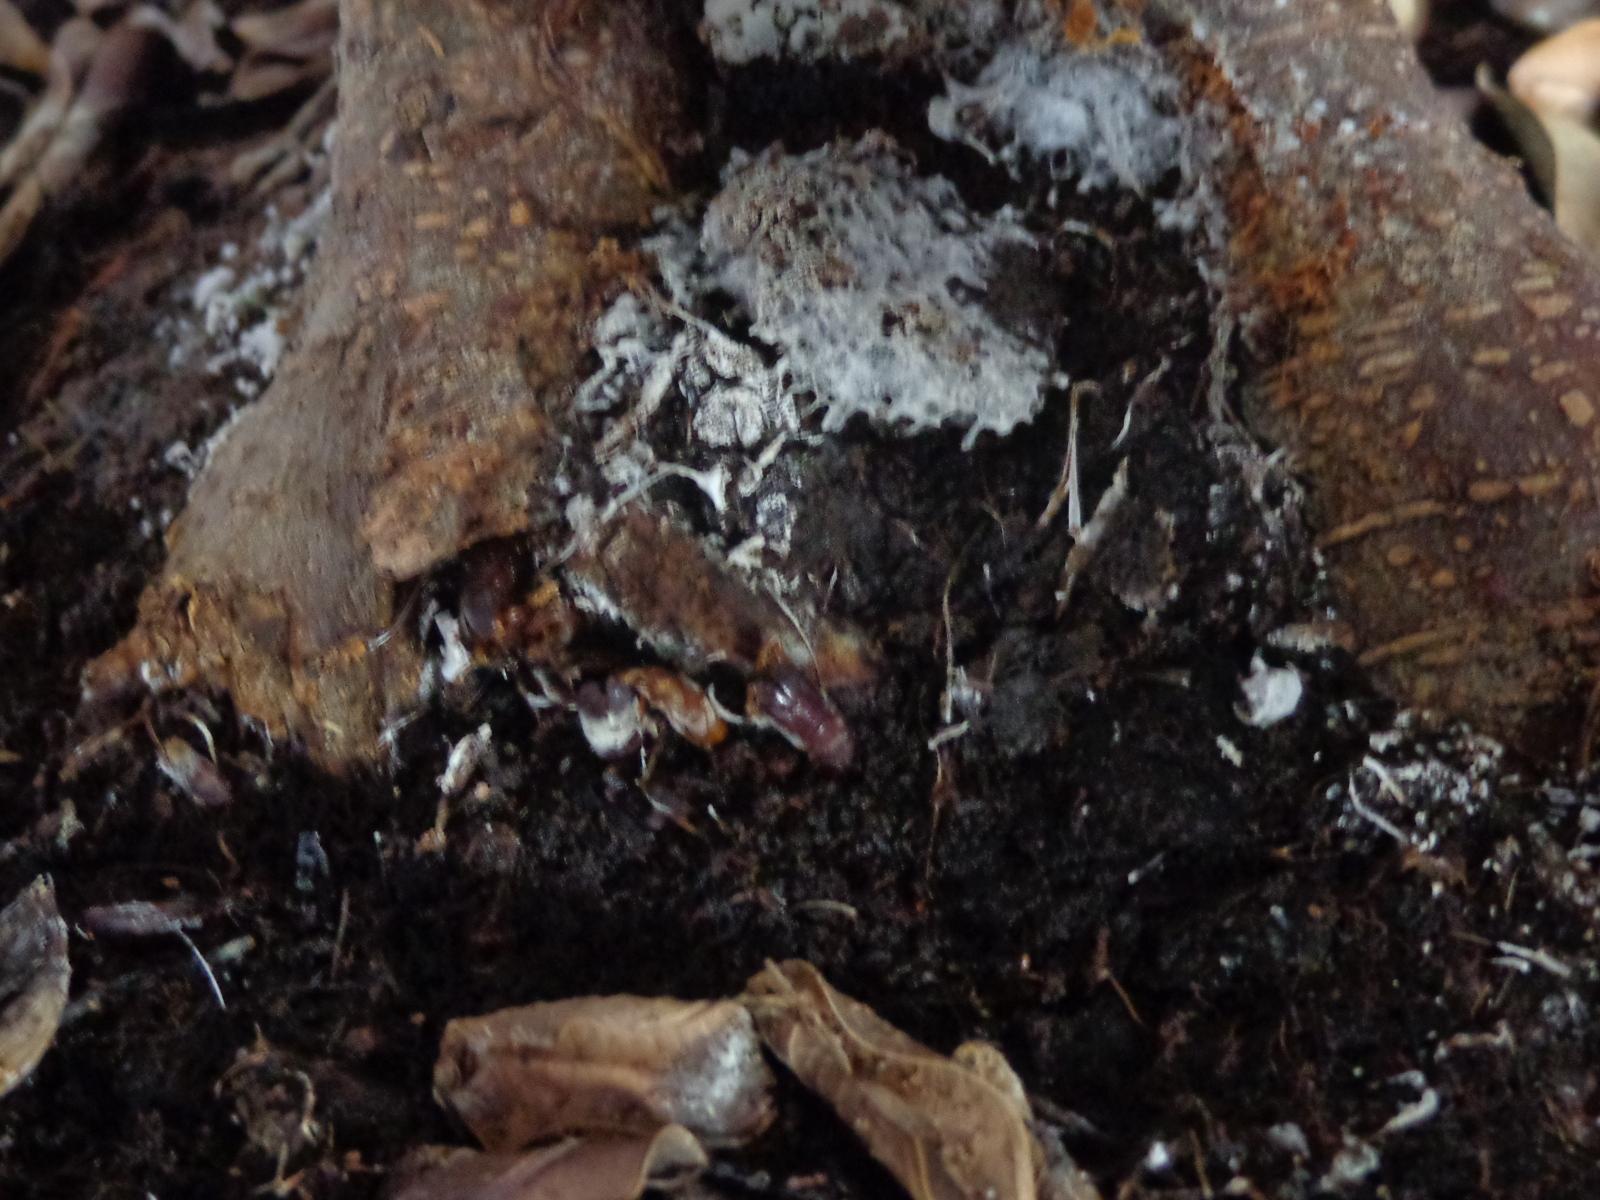 Plaga en mi bonsai ¡AYUDA! 10nbwjn